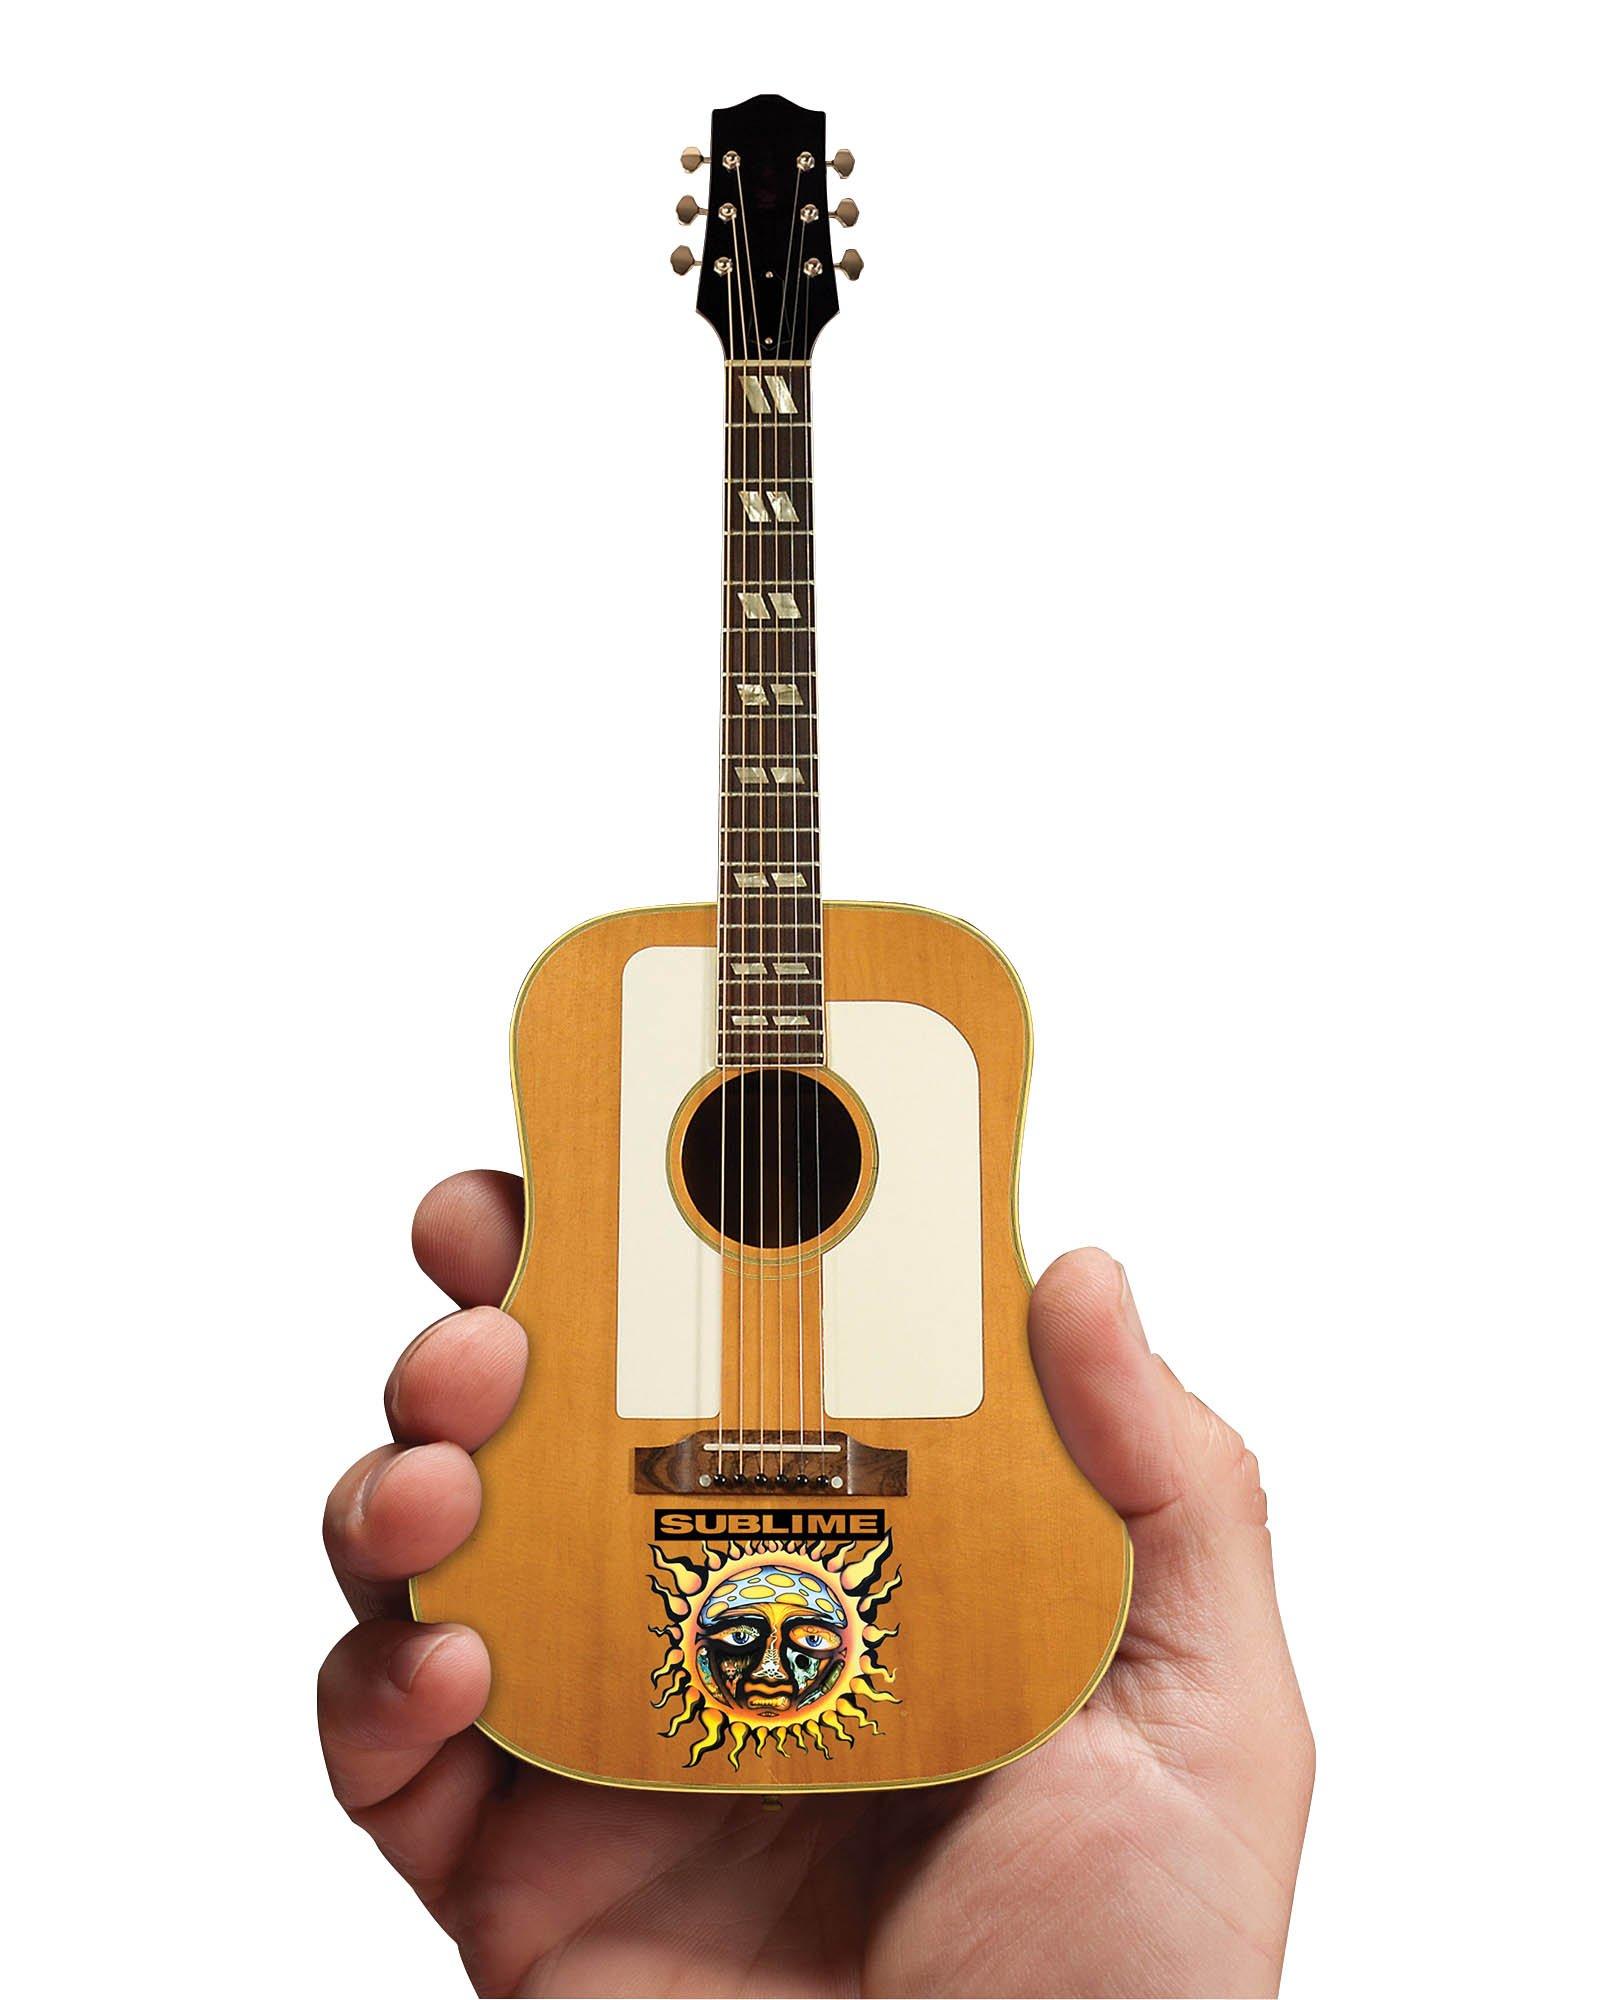 Iconic Concepts 2M-S09-5007 Sublime Acoustic Mini Guitar Replica Small Sun Face & Logo